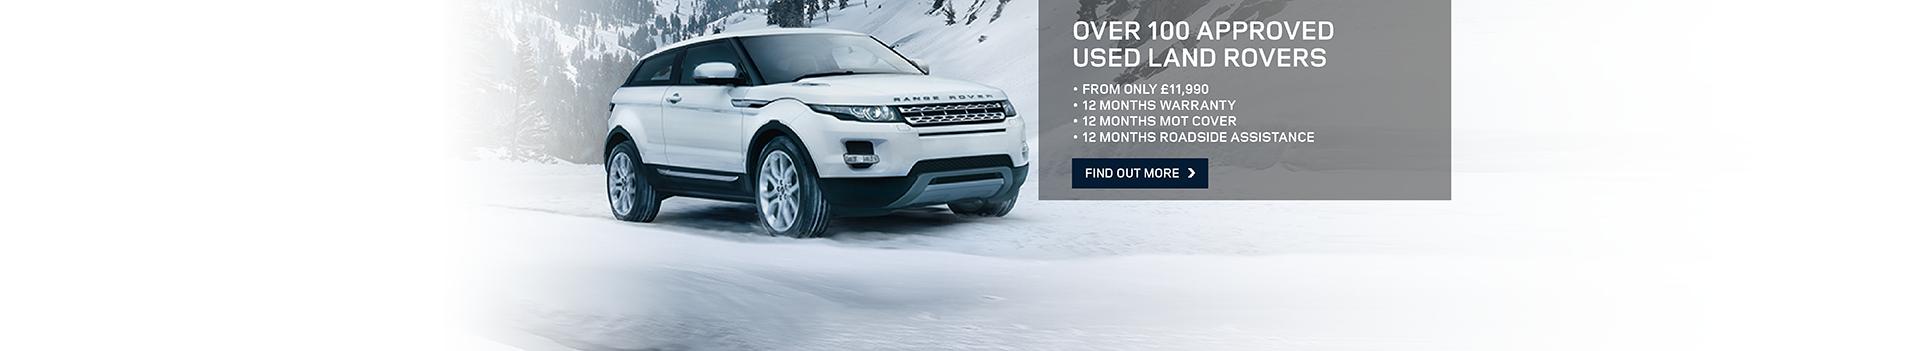 Land Rover Offer